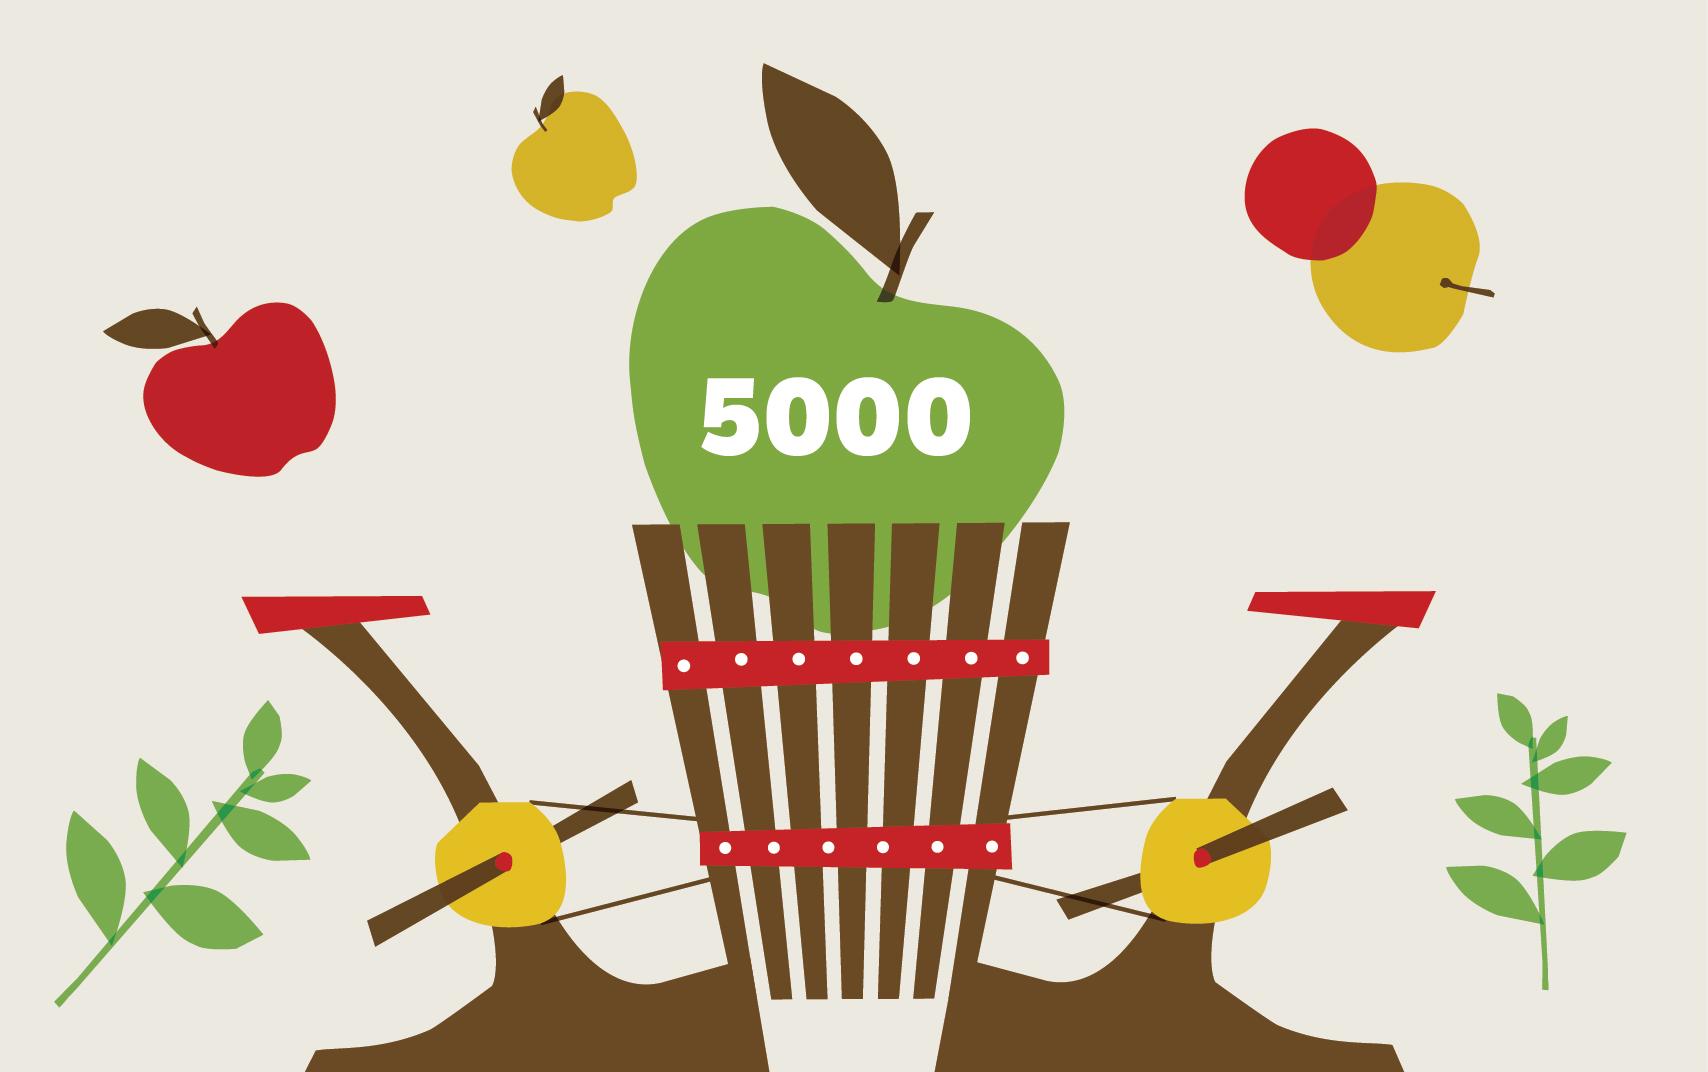 SLAPOSTROJ-5000-banner.jpg-TLaMVIWdOTUxlFXSuWDtPgKr.jpg